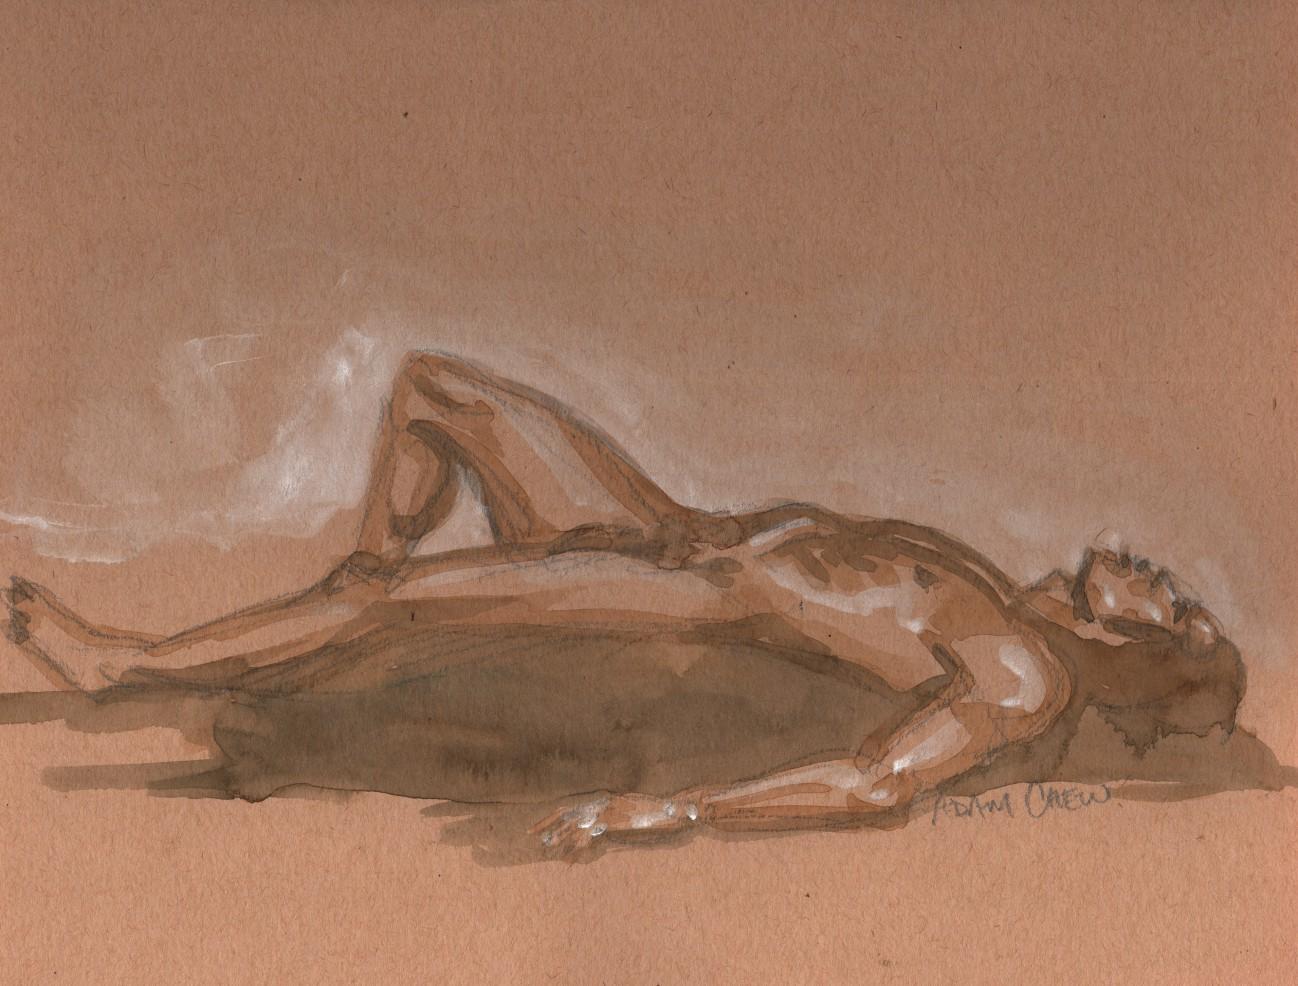 man-laying-2-AdamChew-2013